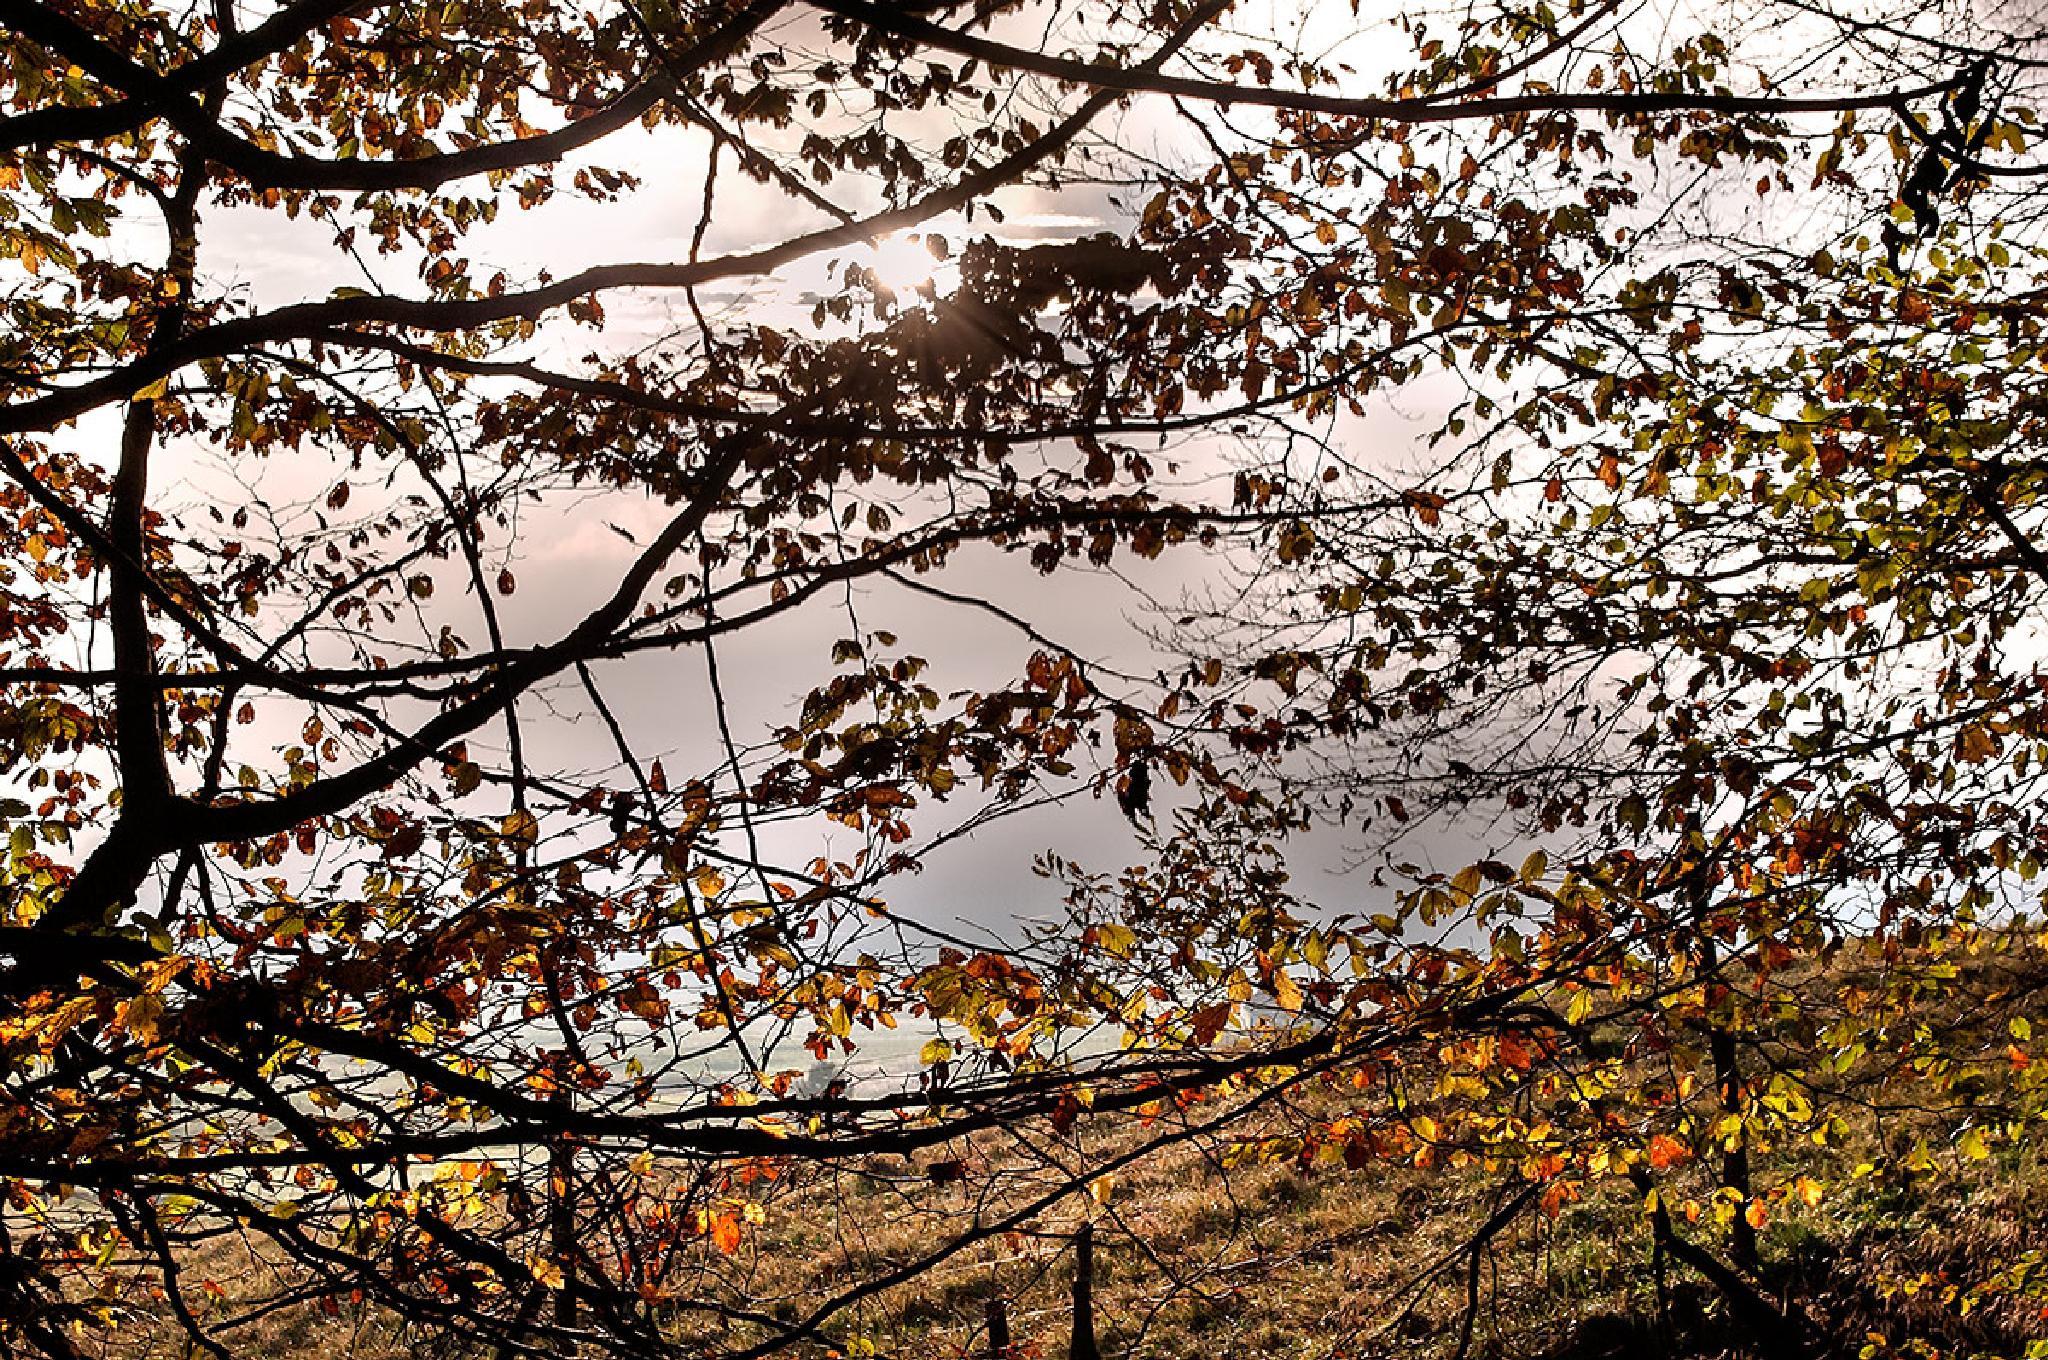 autumn by Amerigo